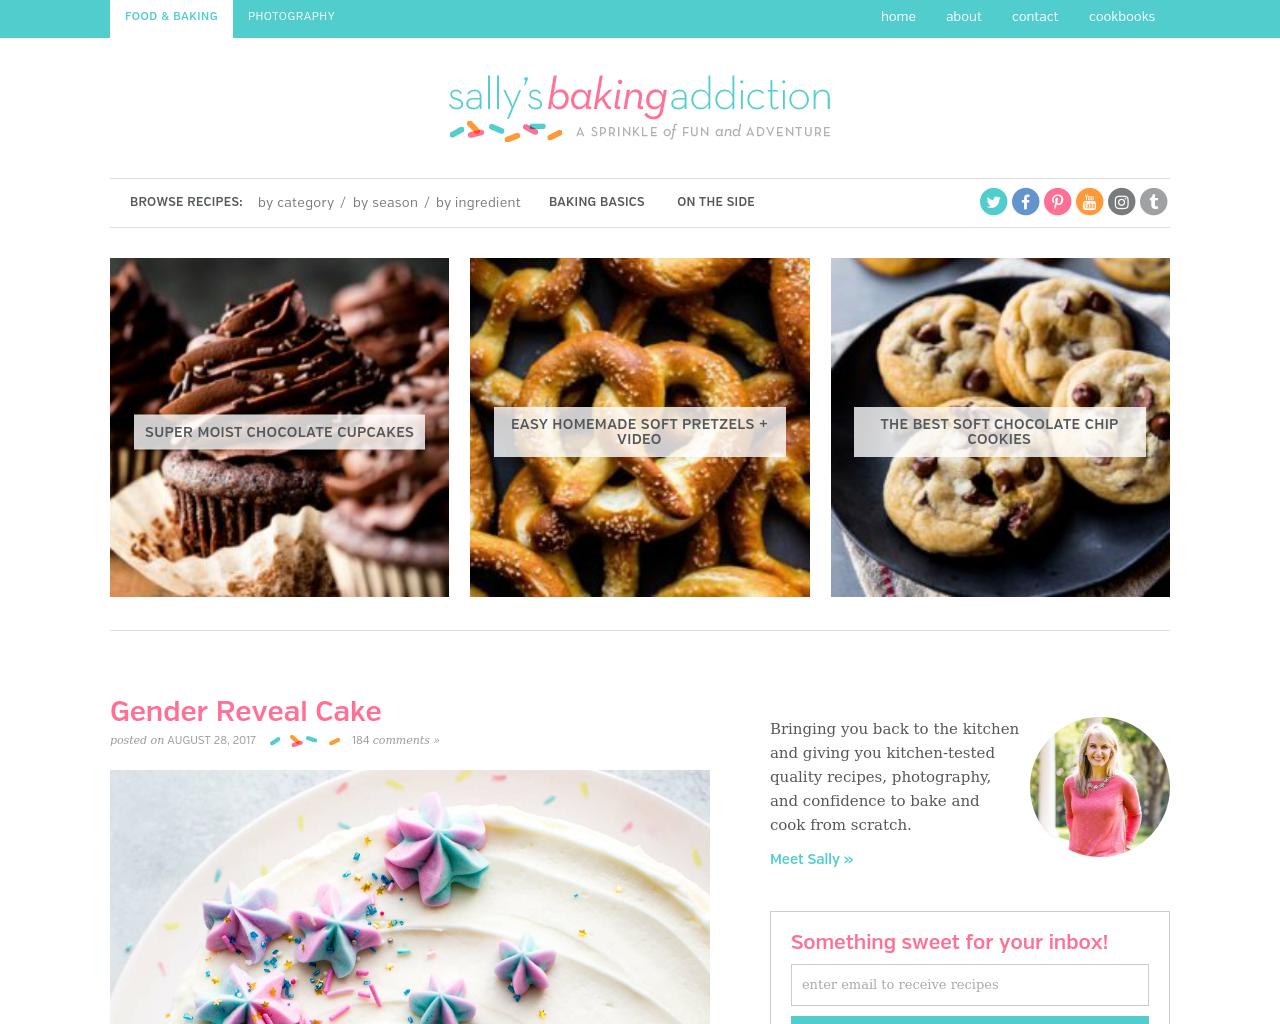 Sallys-Baking-Addiction-Advertising-Reviews-Pricing